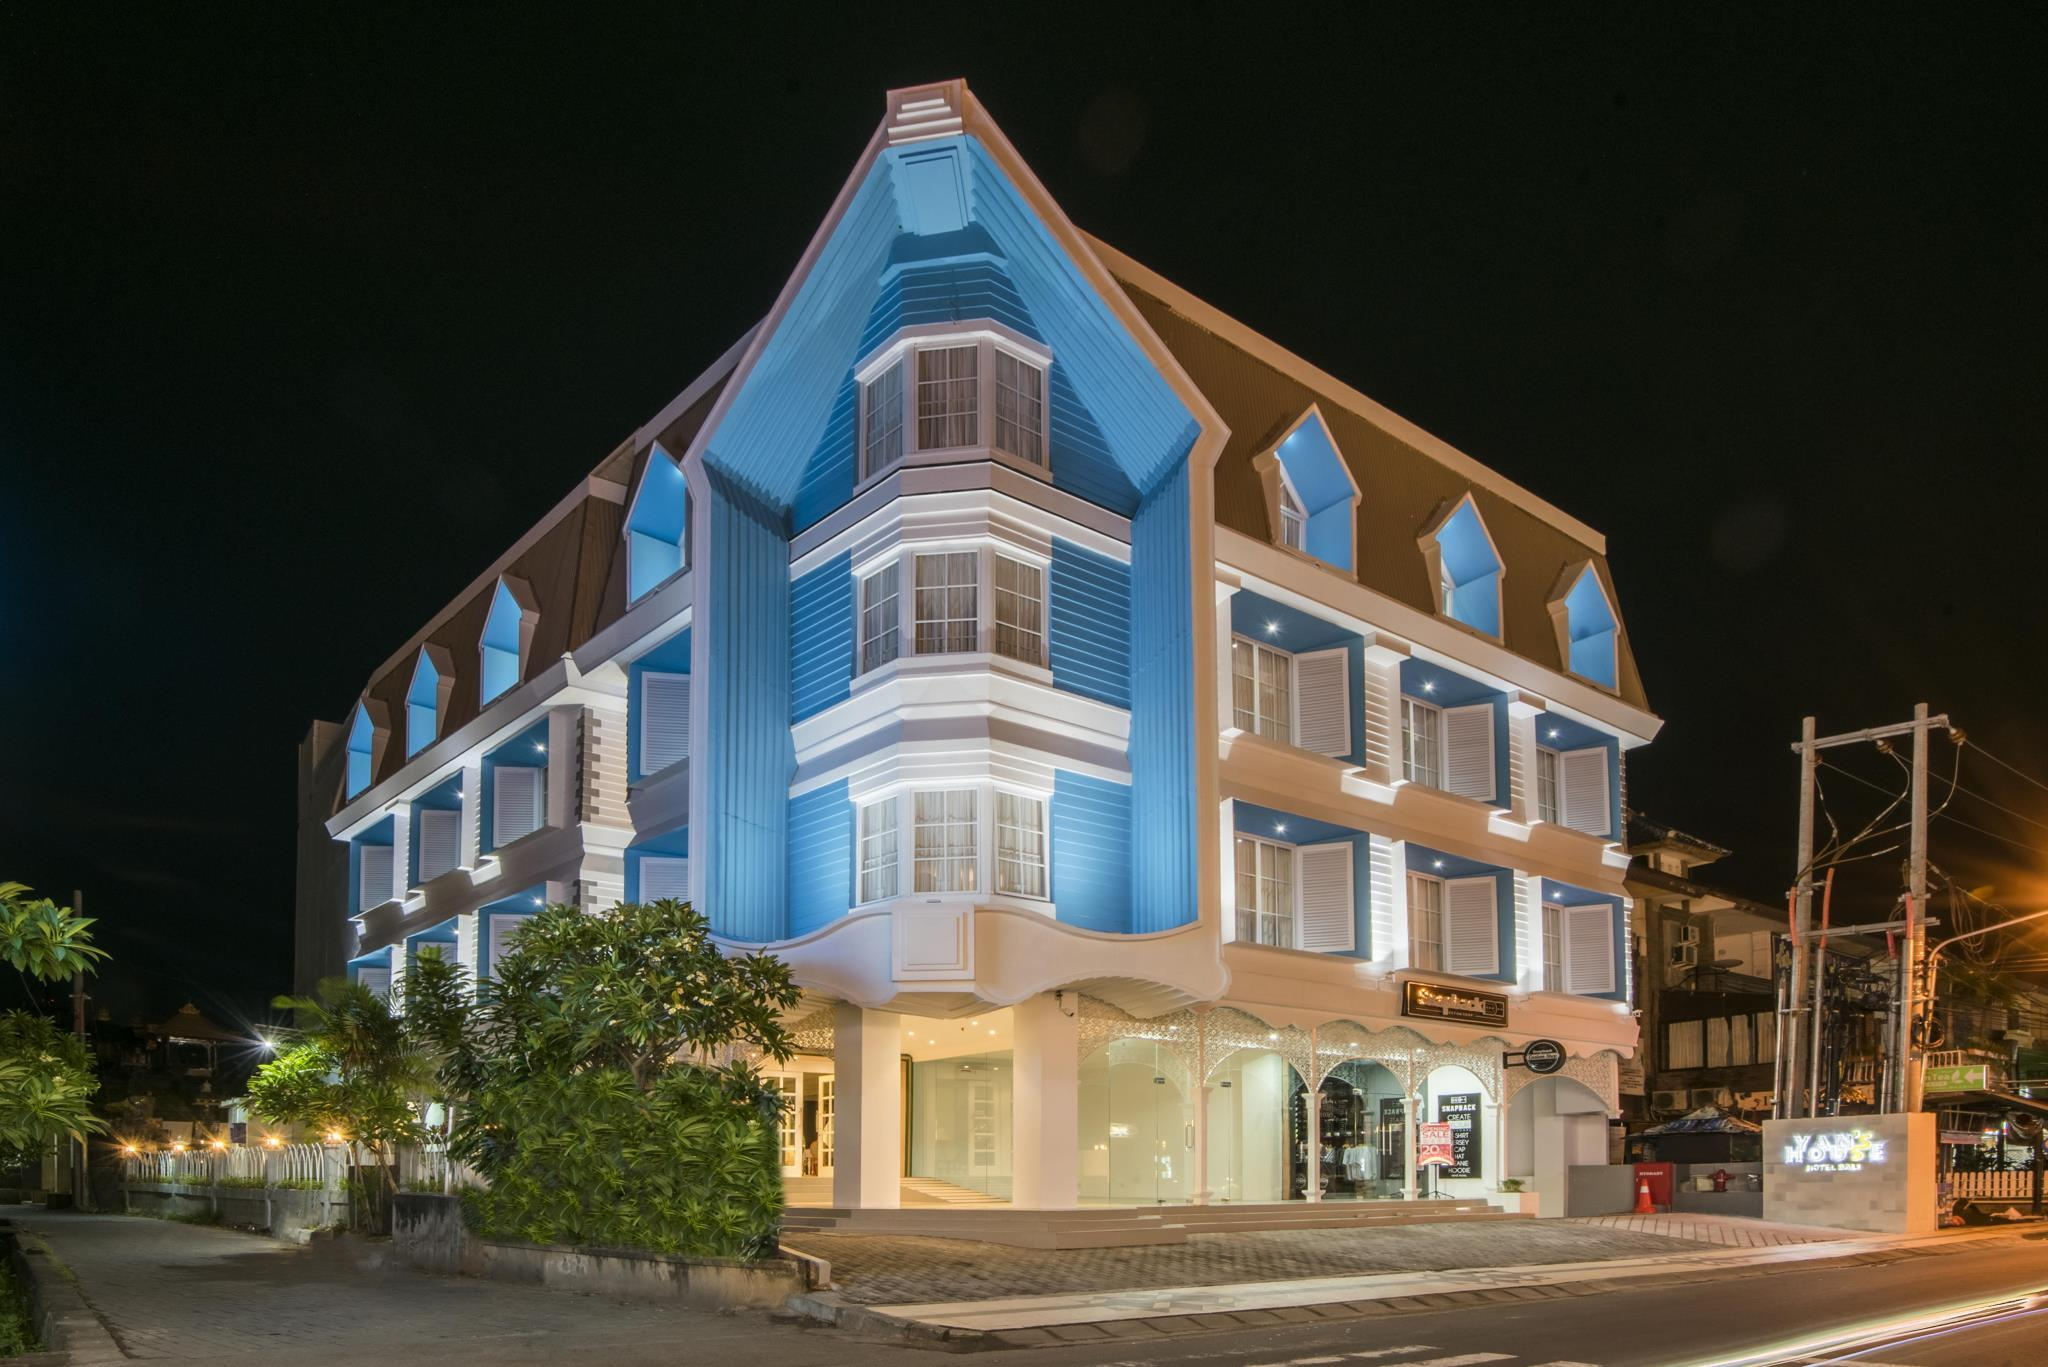 Yans House Hotel